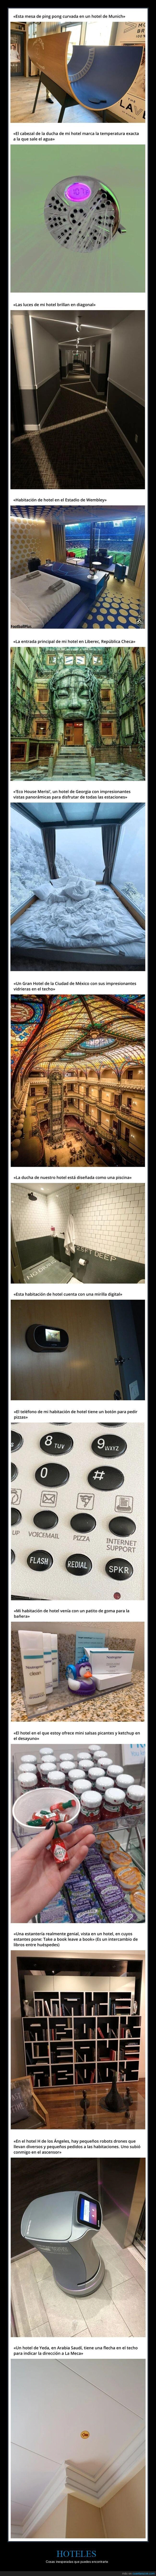 hoteles,inesperado